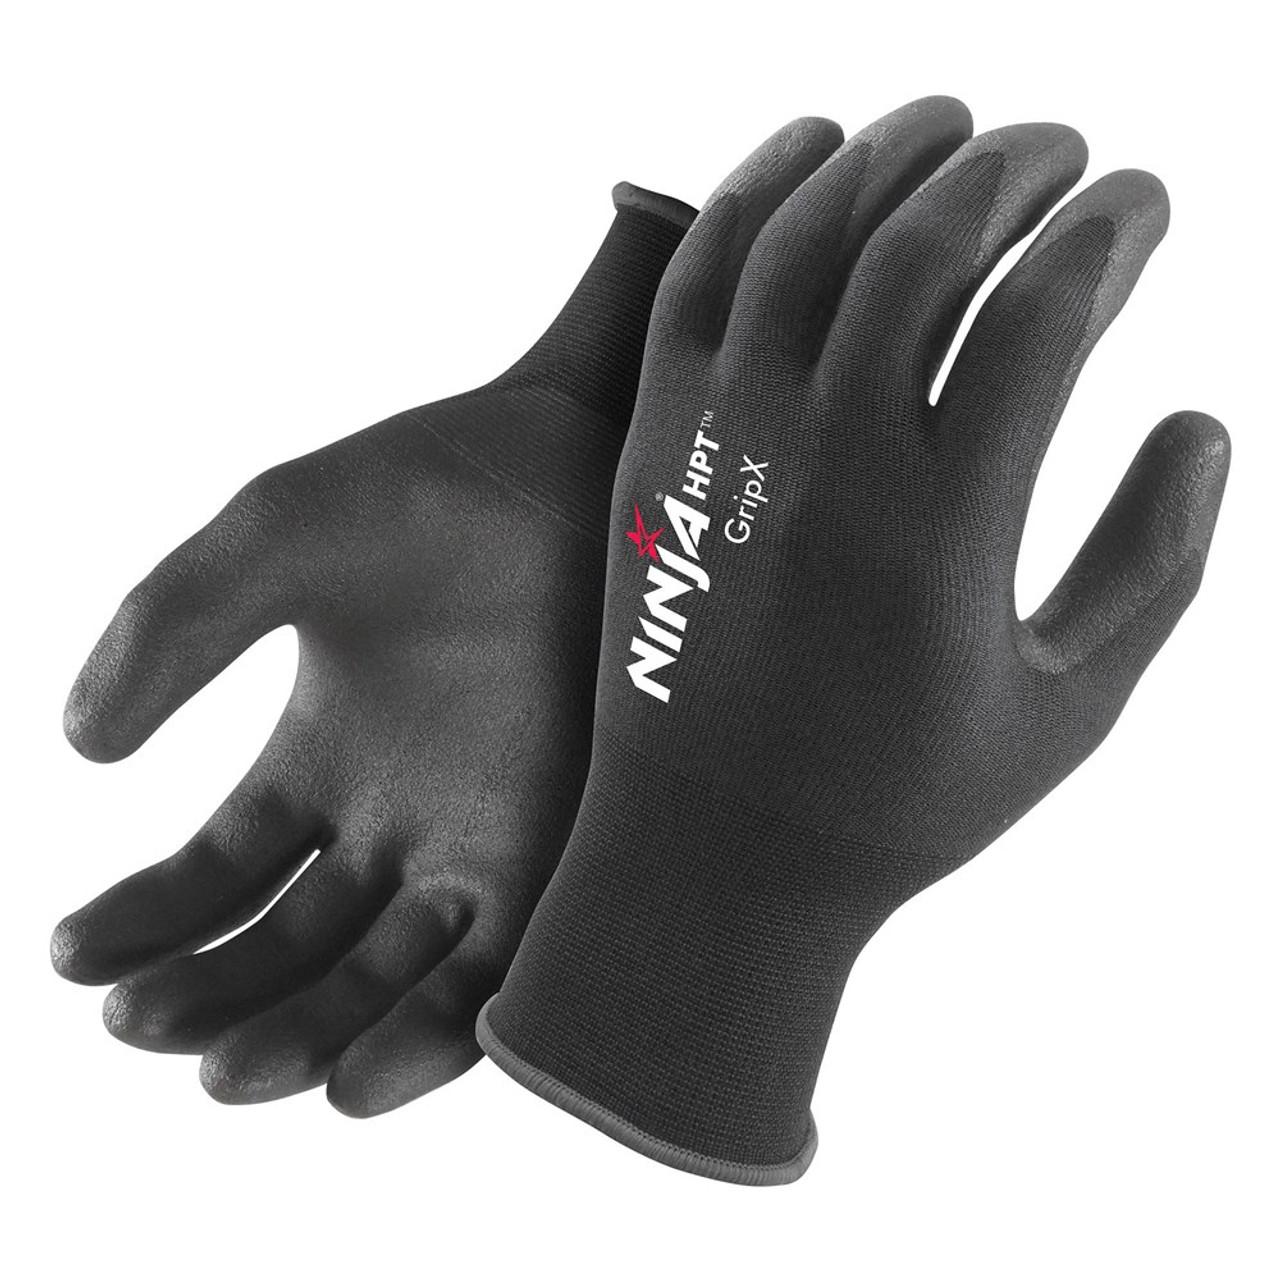 Gloves - Ninja Grip - XL